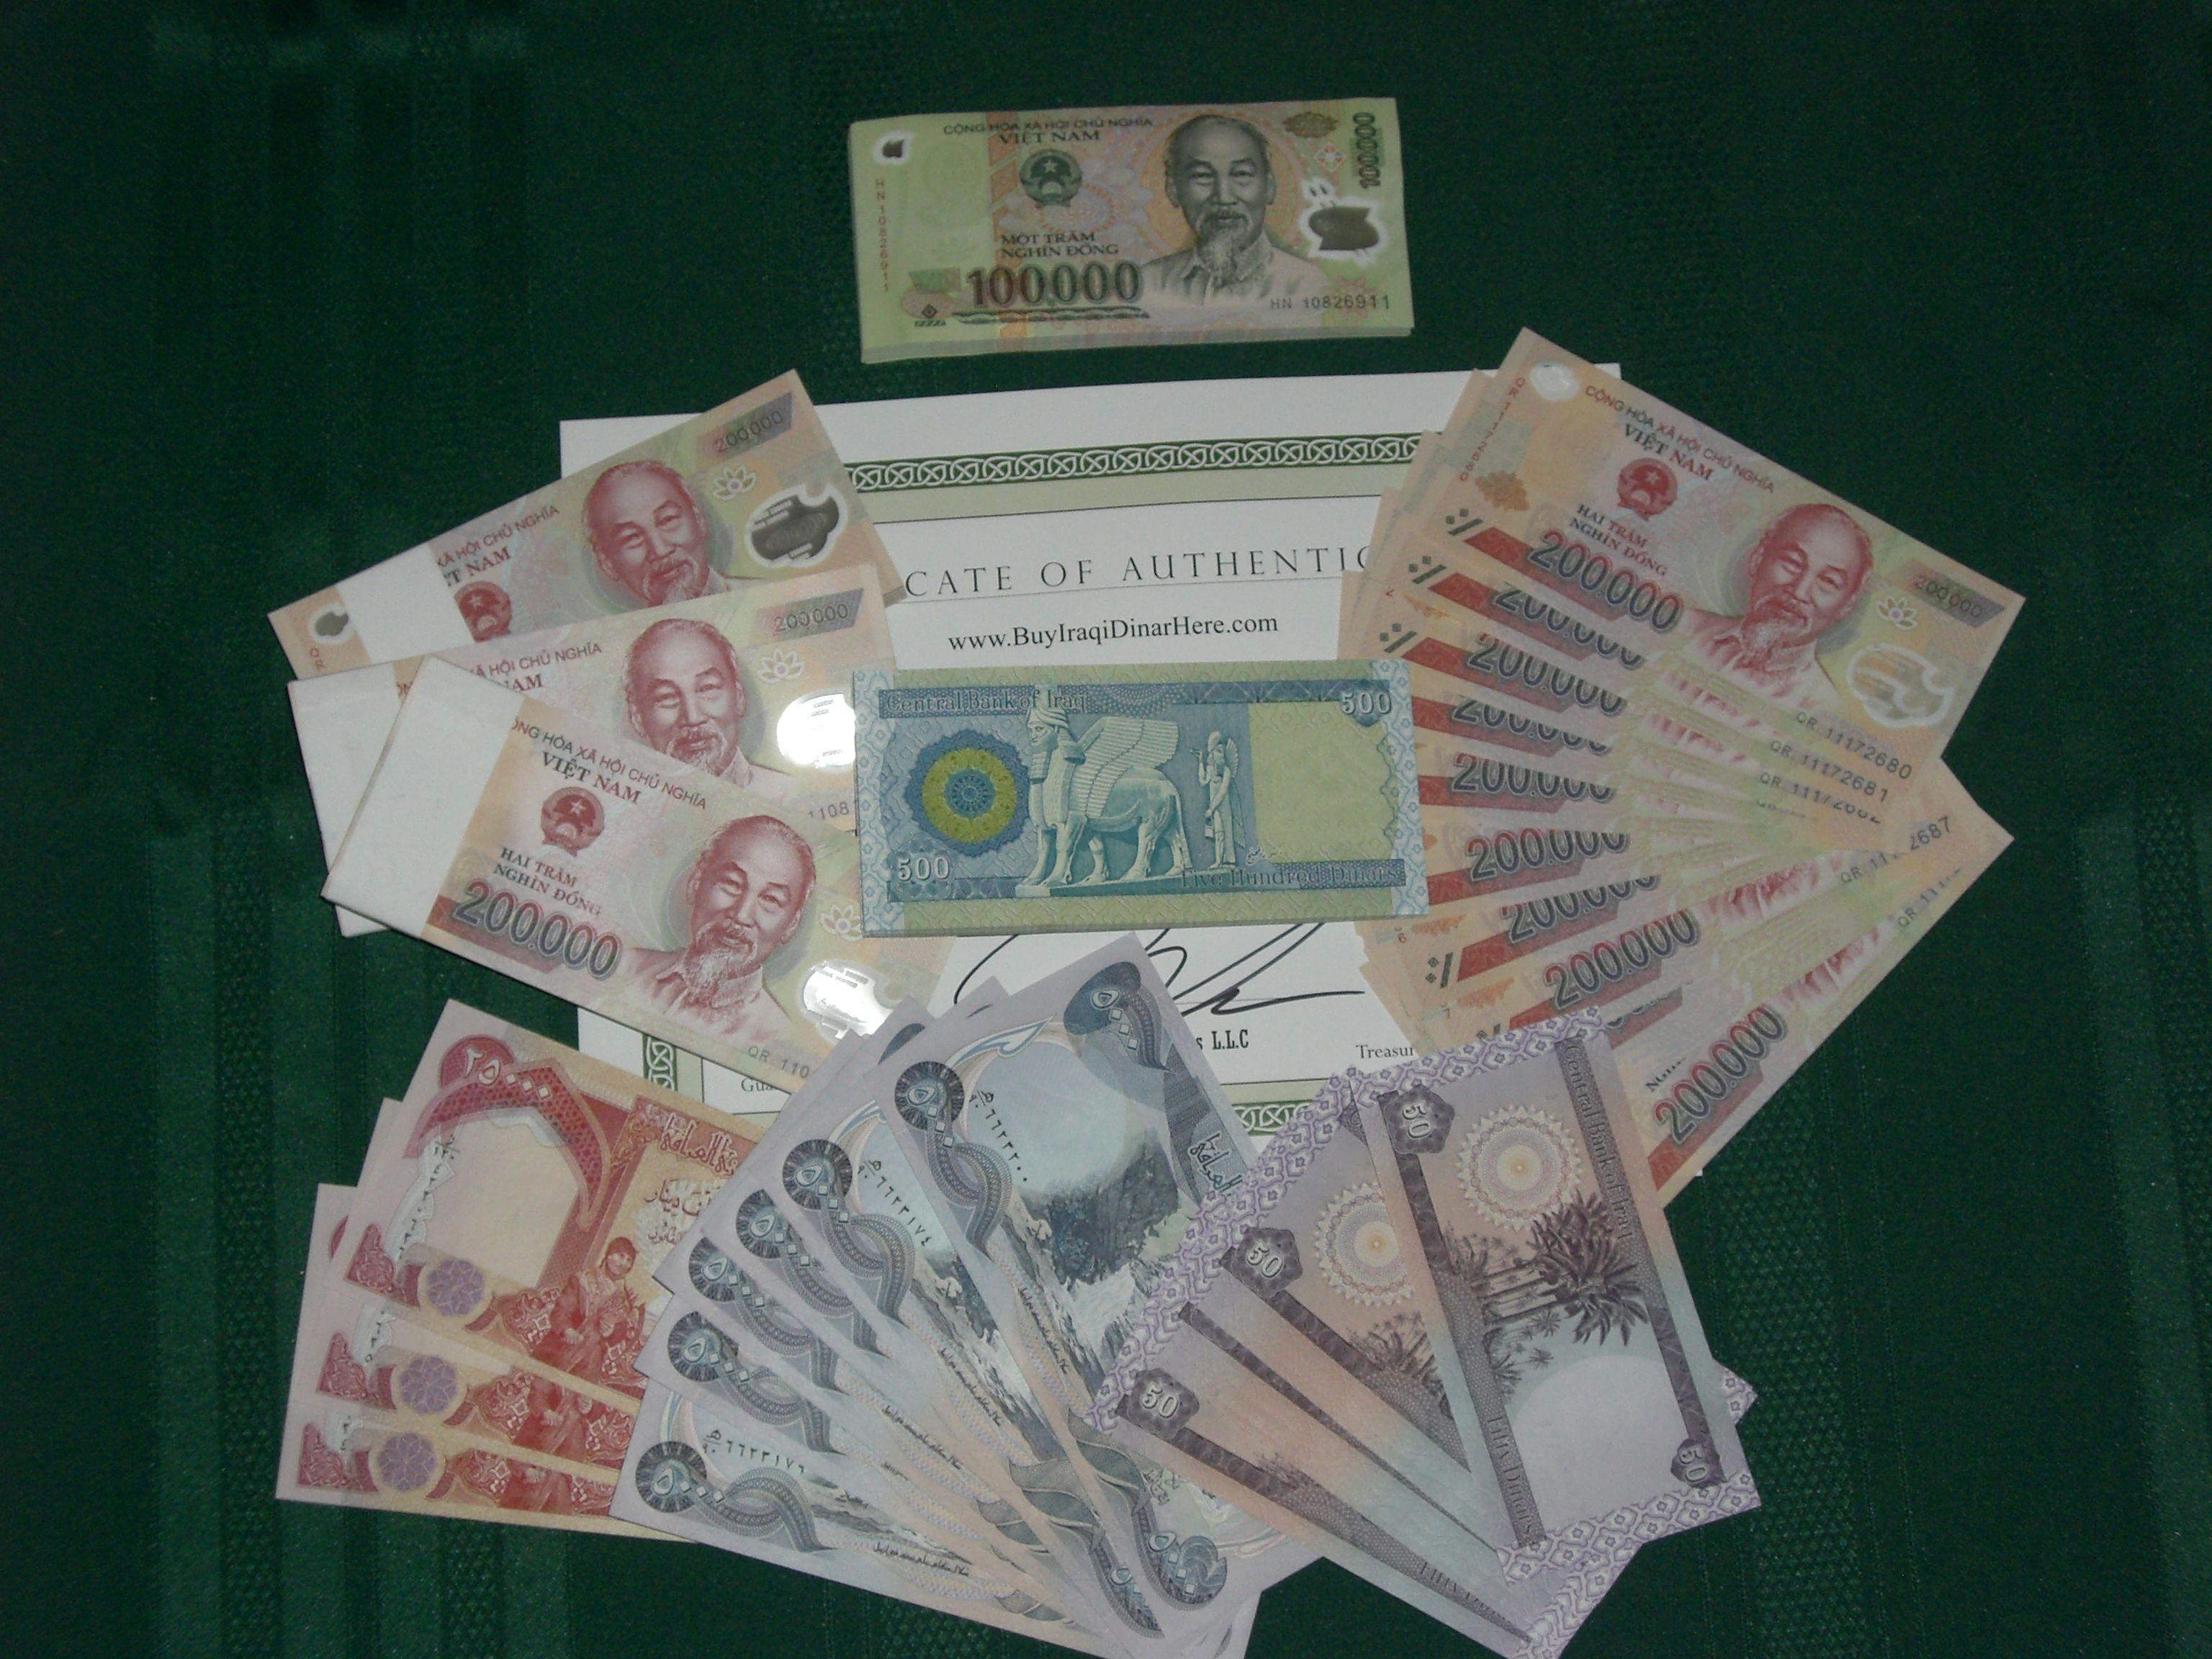 Iraqi Dinar Vietnam Dong Coa Certificate Of Authenticity Iraqidinar